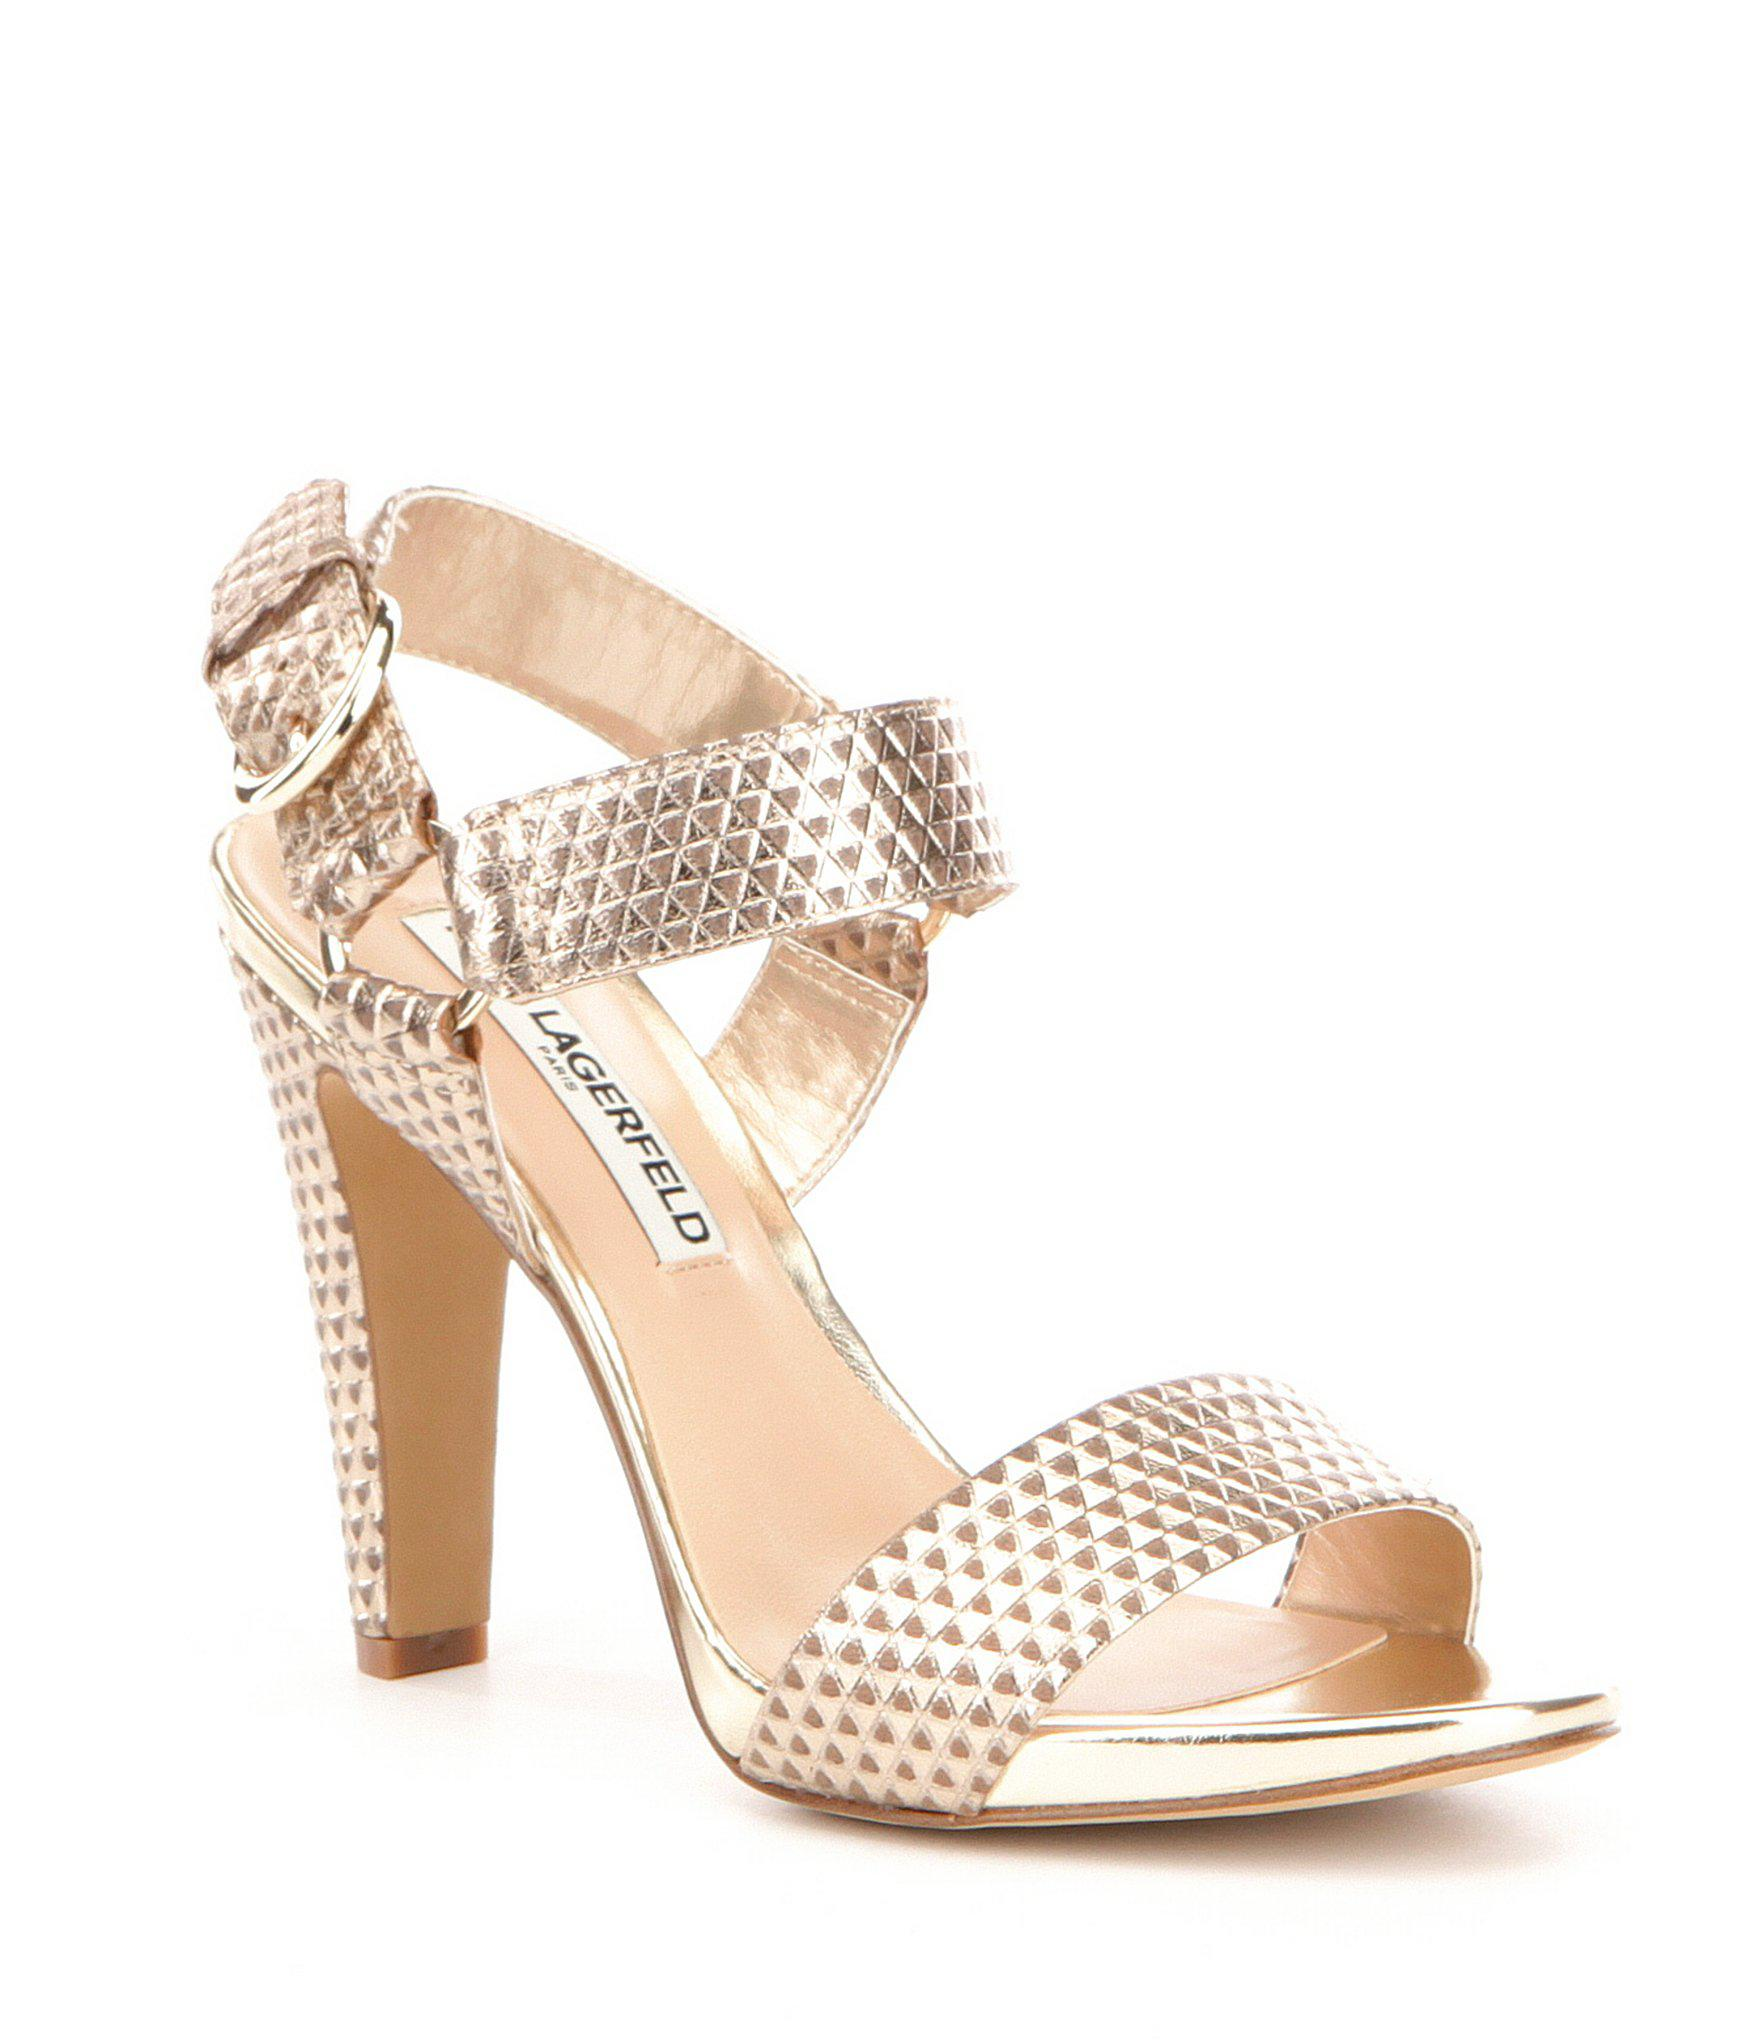 3c7a1051b2a Lyst - Karl Lagerfeld Cieone Metallic Leather Ankle Strap Dress ...